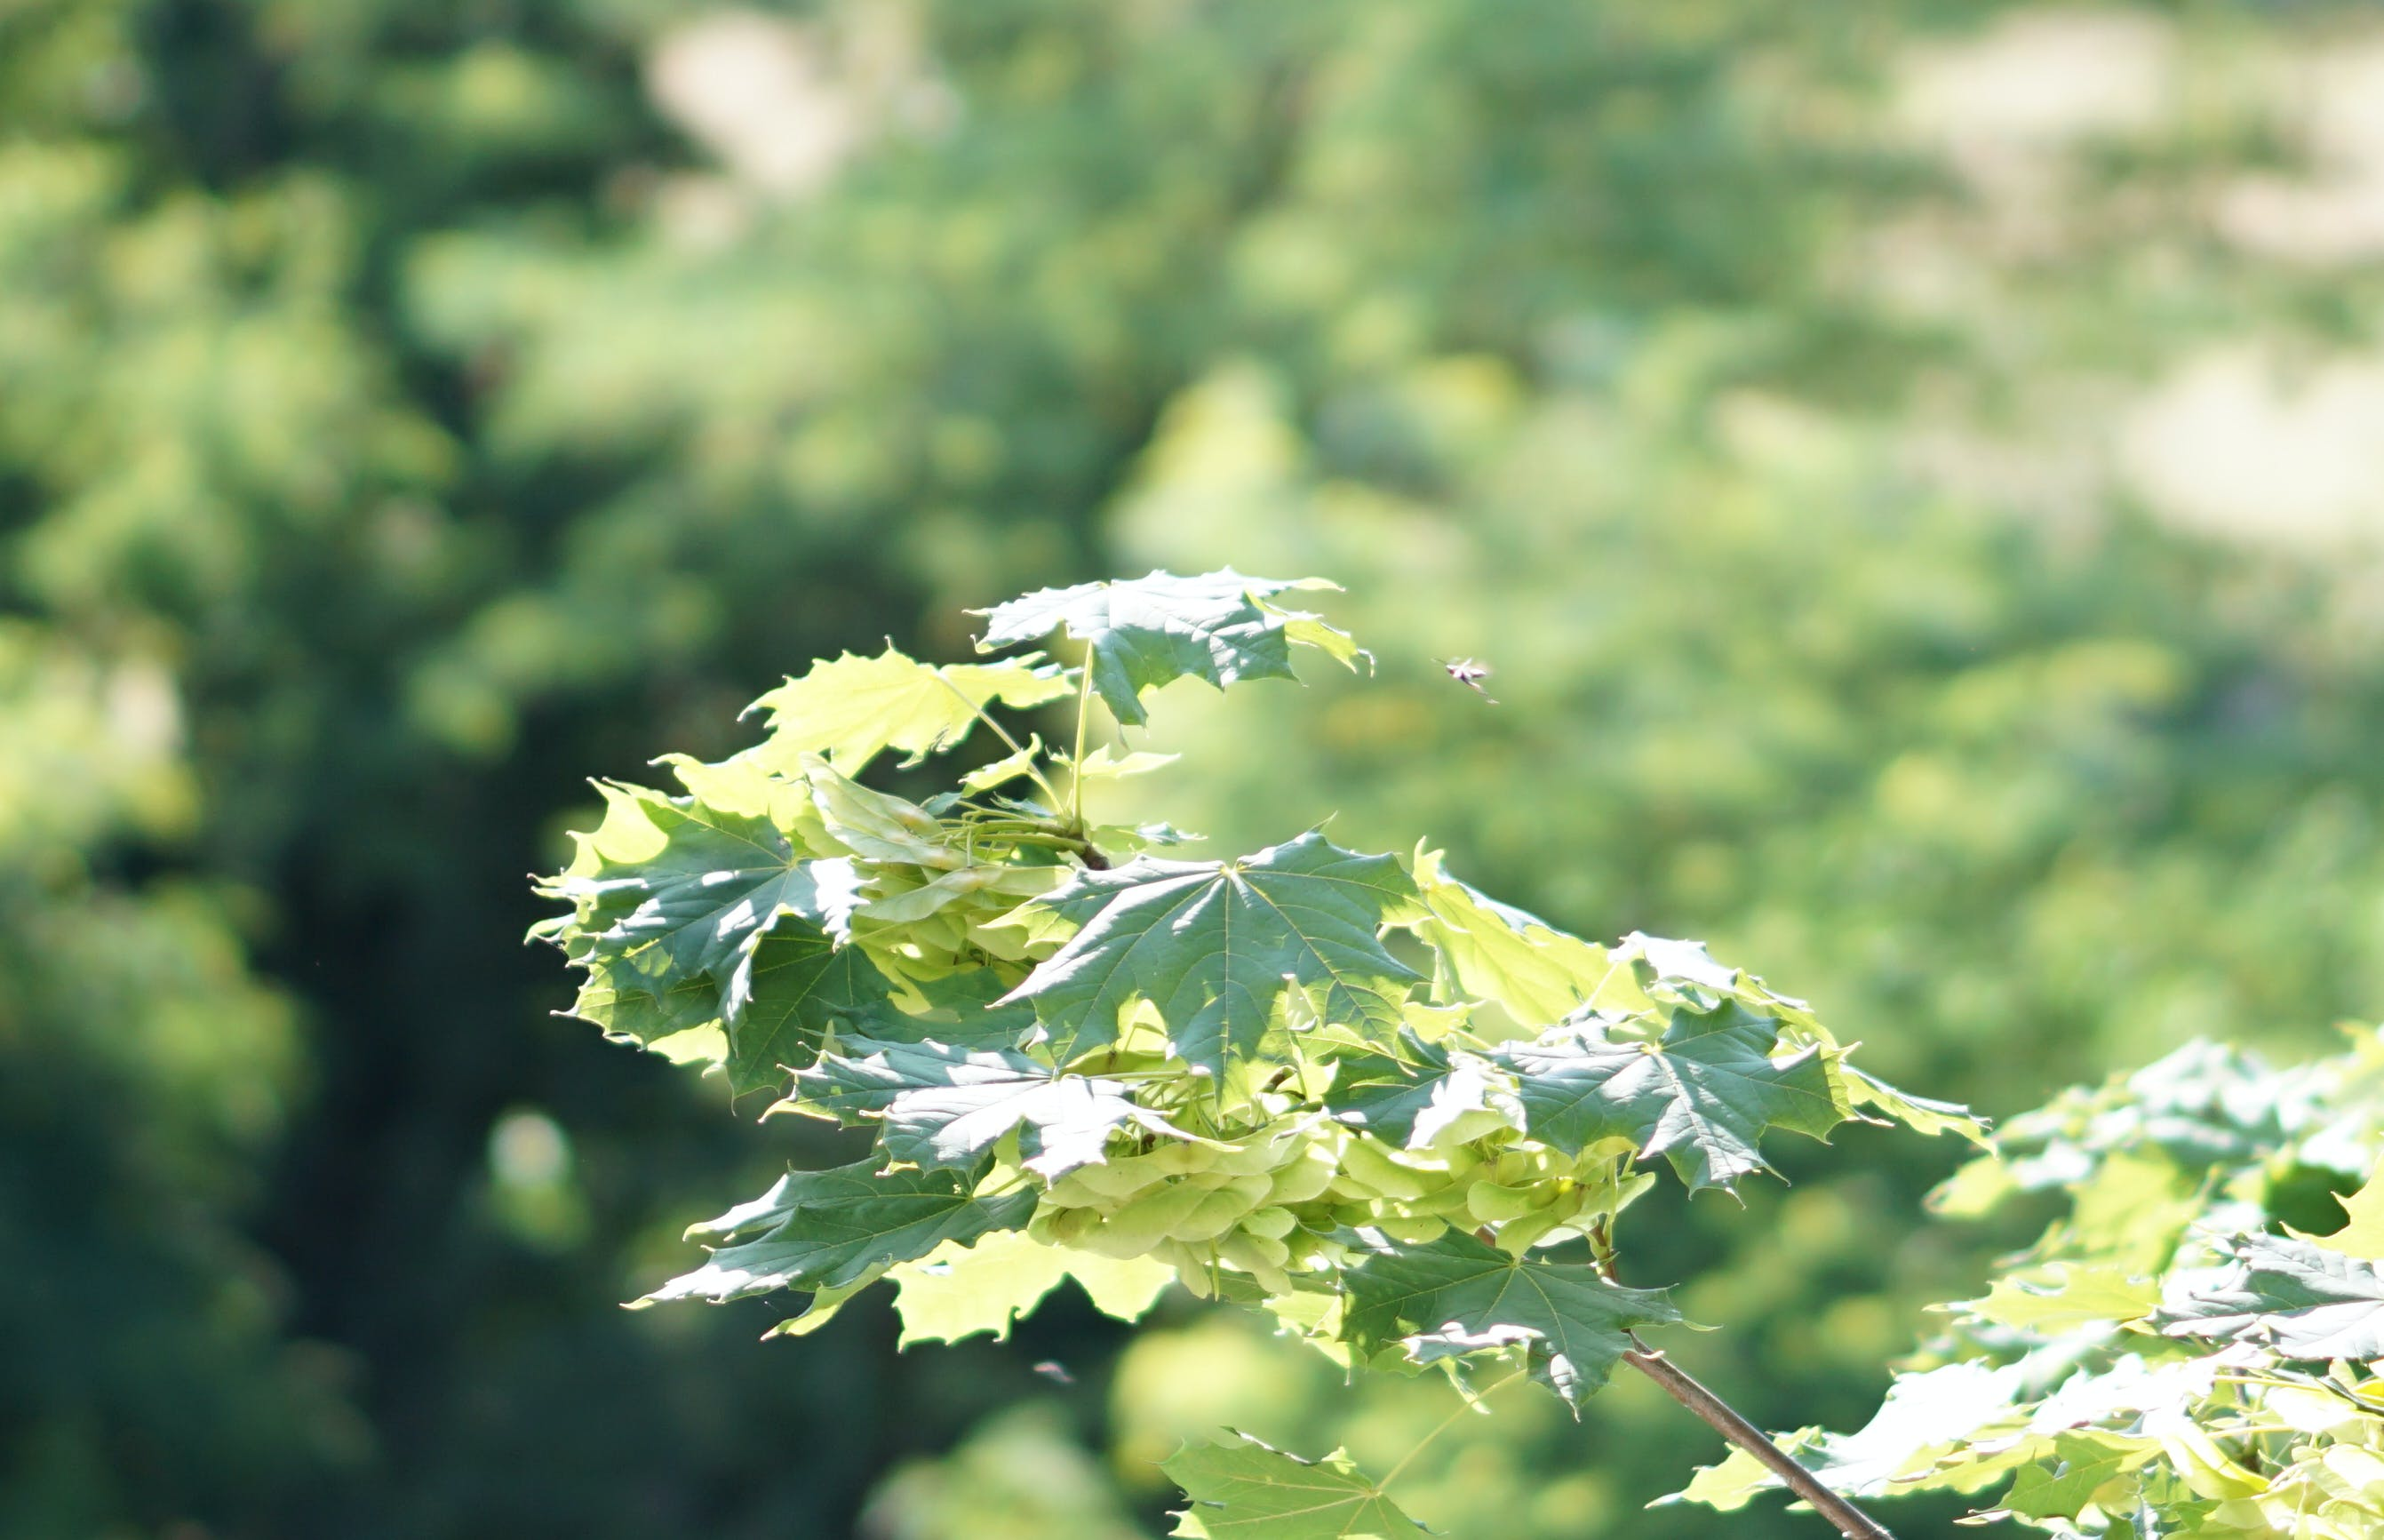 Free stock photo of #Tree, ecology, environment, focus